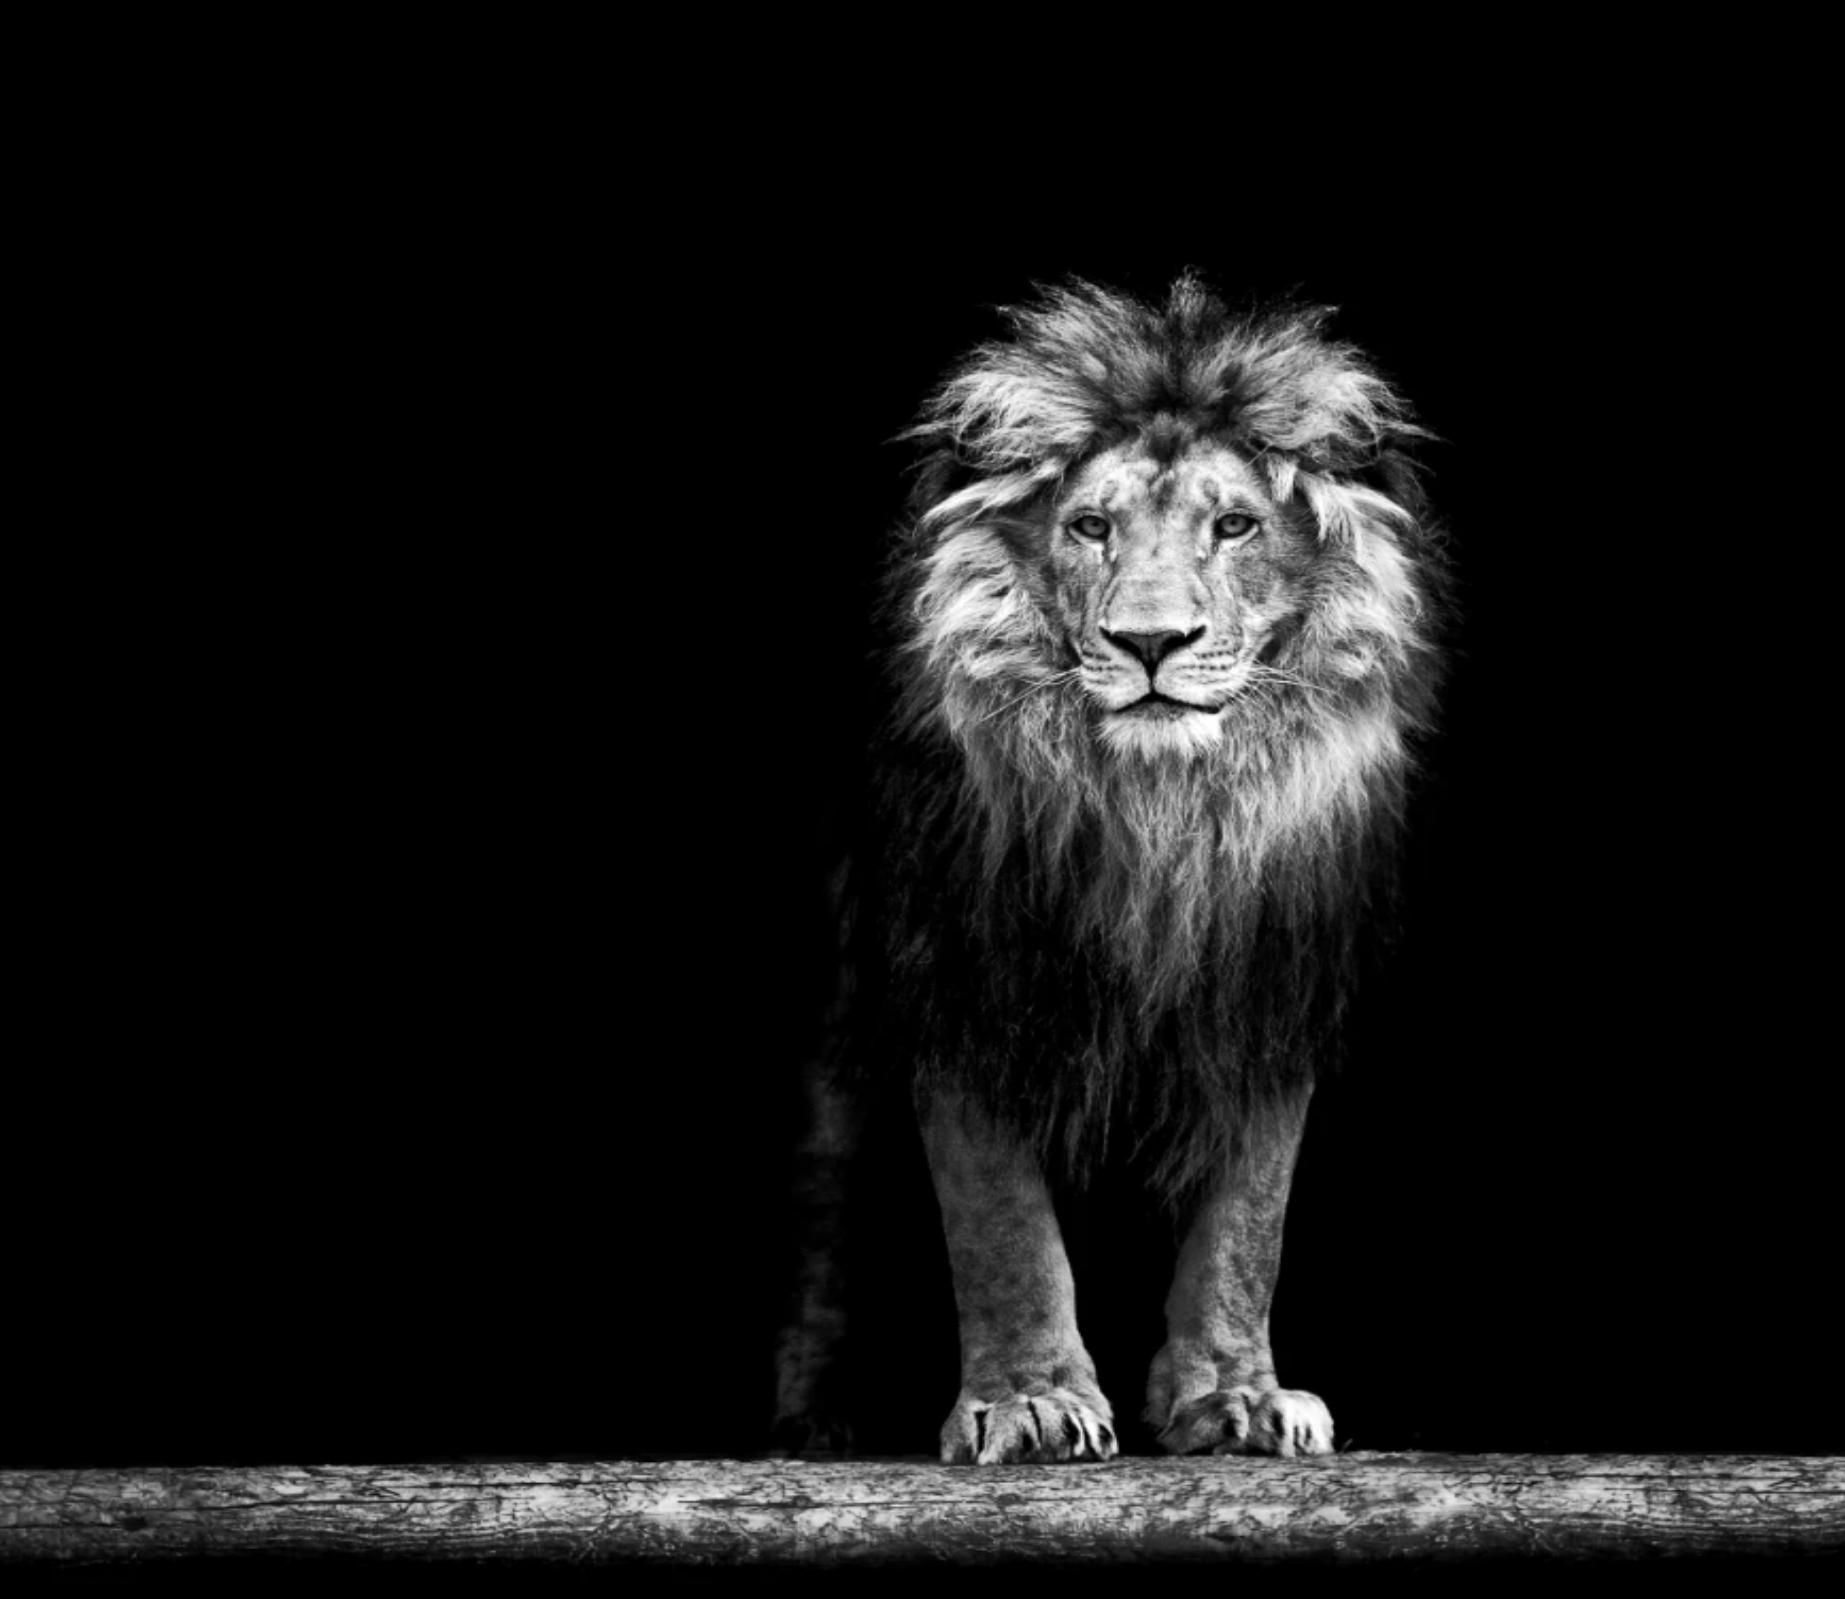 standing lion black standing lion heraldry tattoo design stock vector lion standing